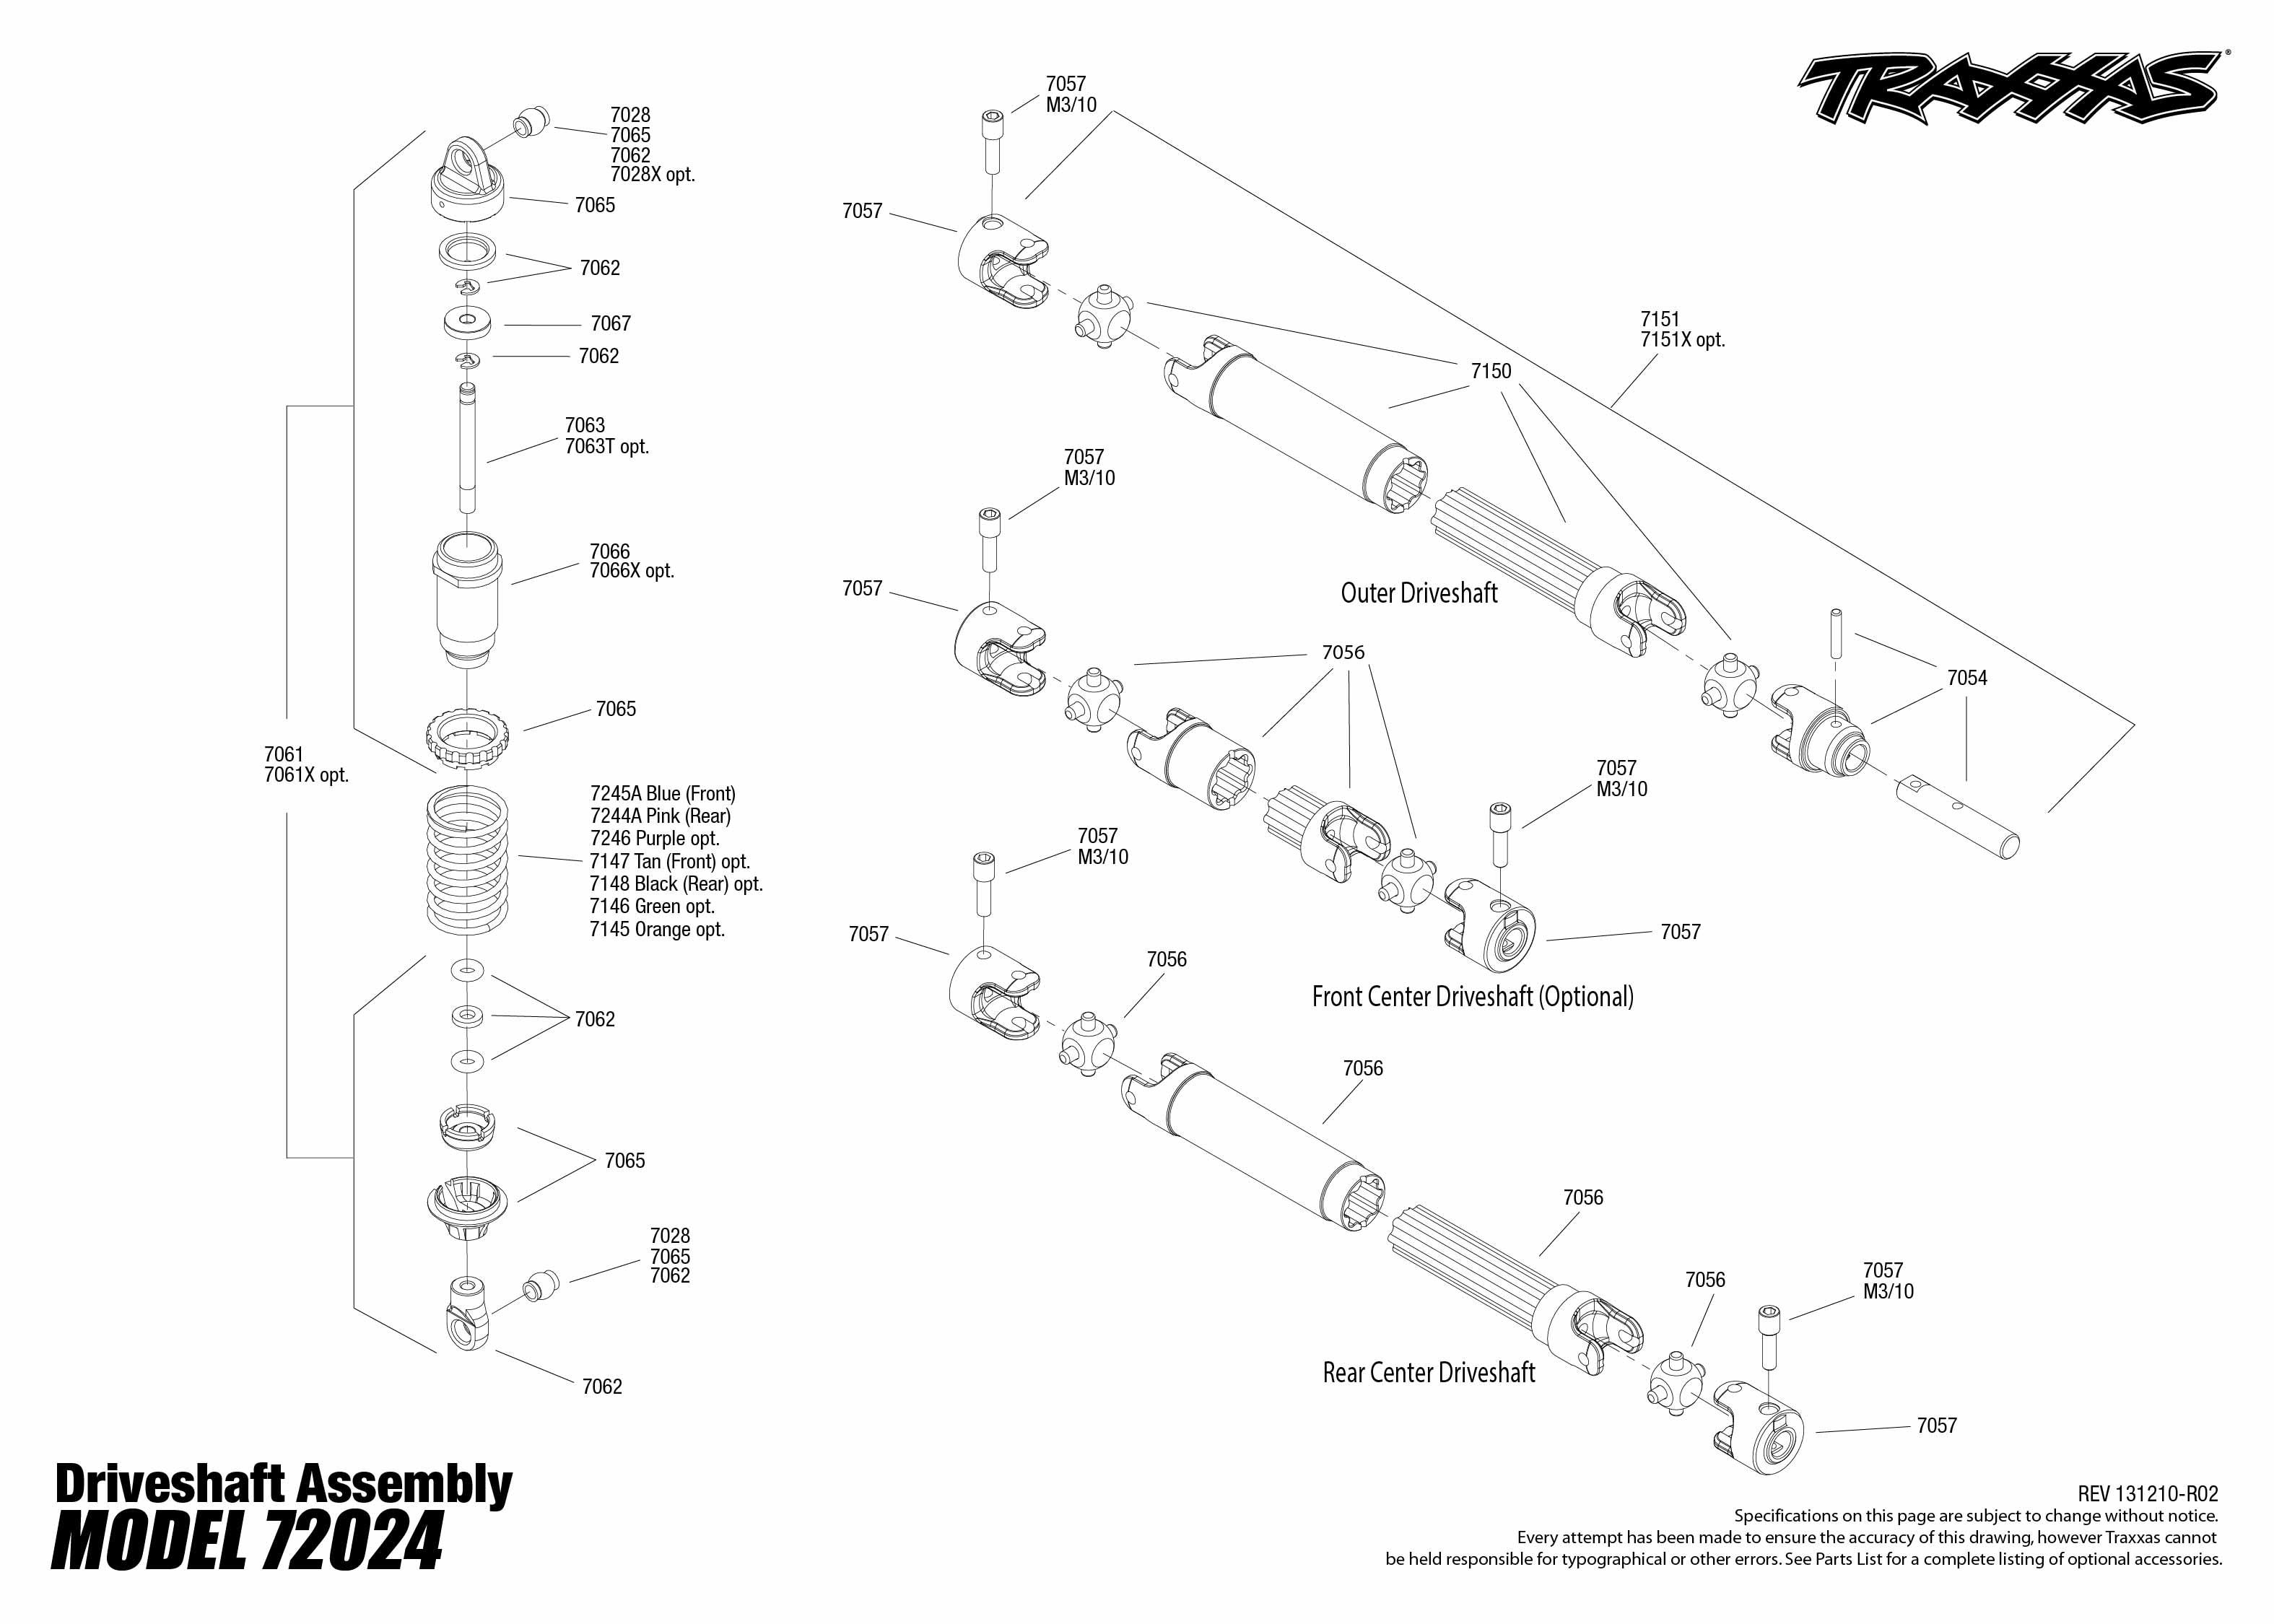 95 yamaha kodiak 400 4x4 wiring diagram 1 16 summit vxl parts diagram engine diagram and wiring traxxas slash 4x4 wiring diagram